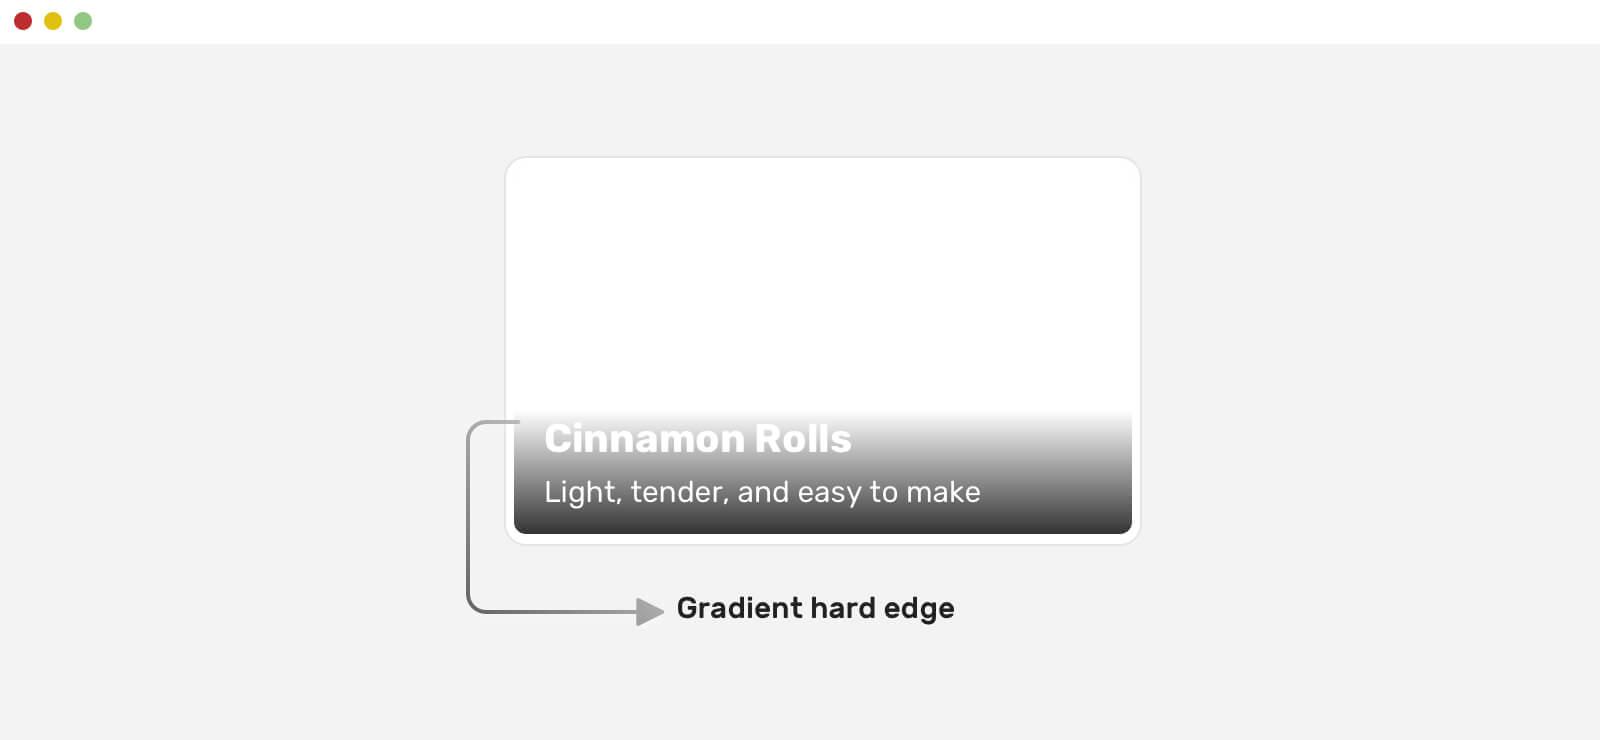 текст поверх изображения с наложением градиента с резким краем